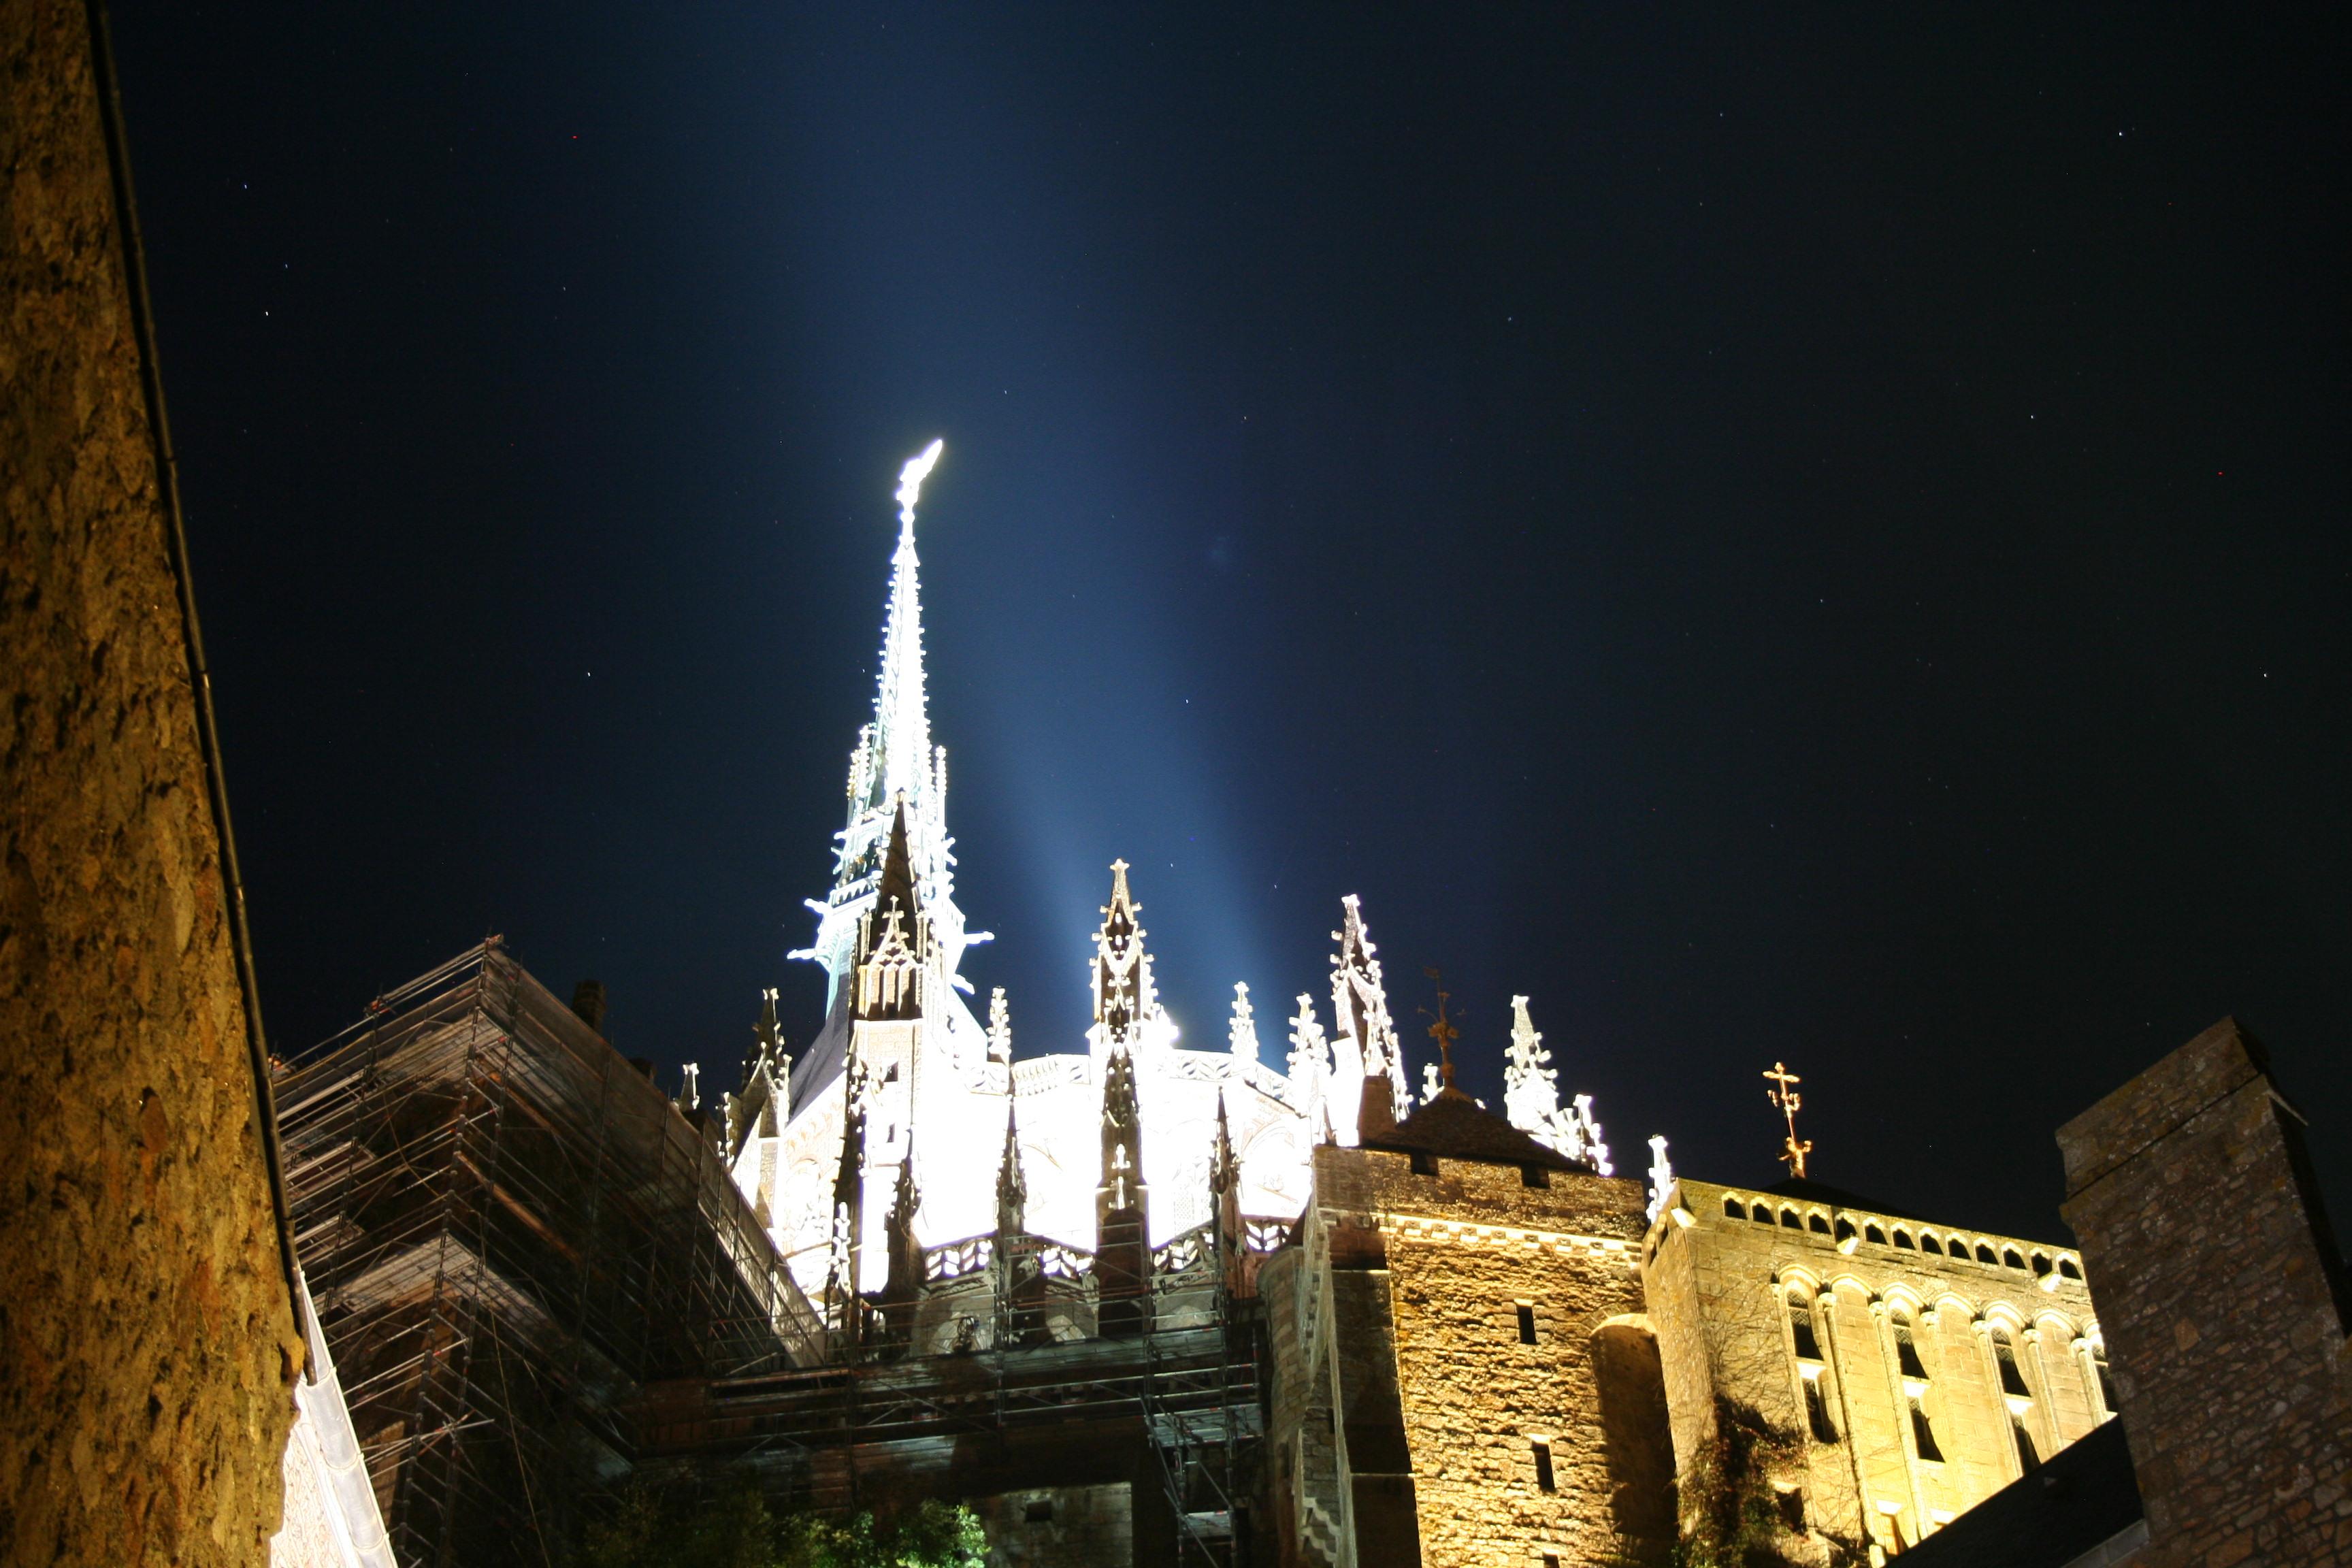 Mont St Michel Apex at Night